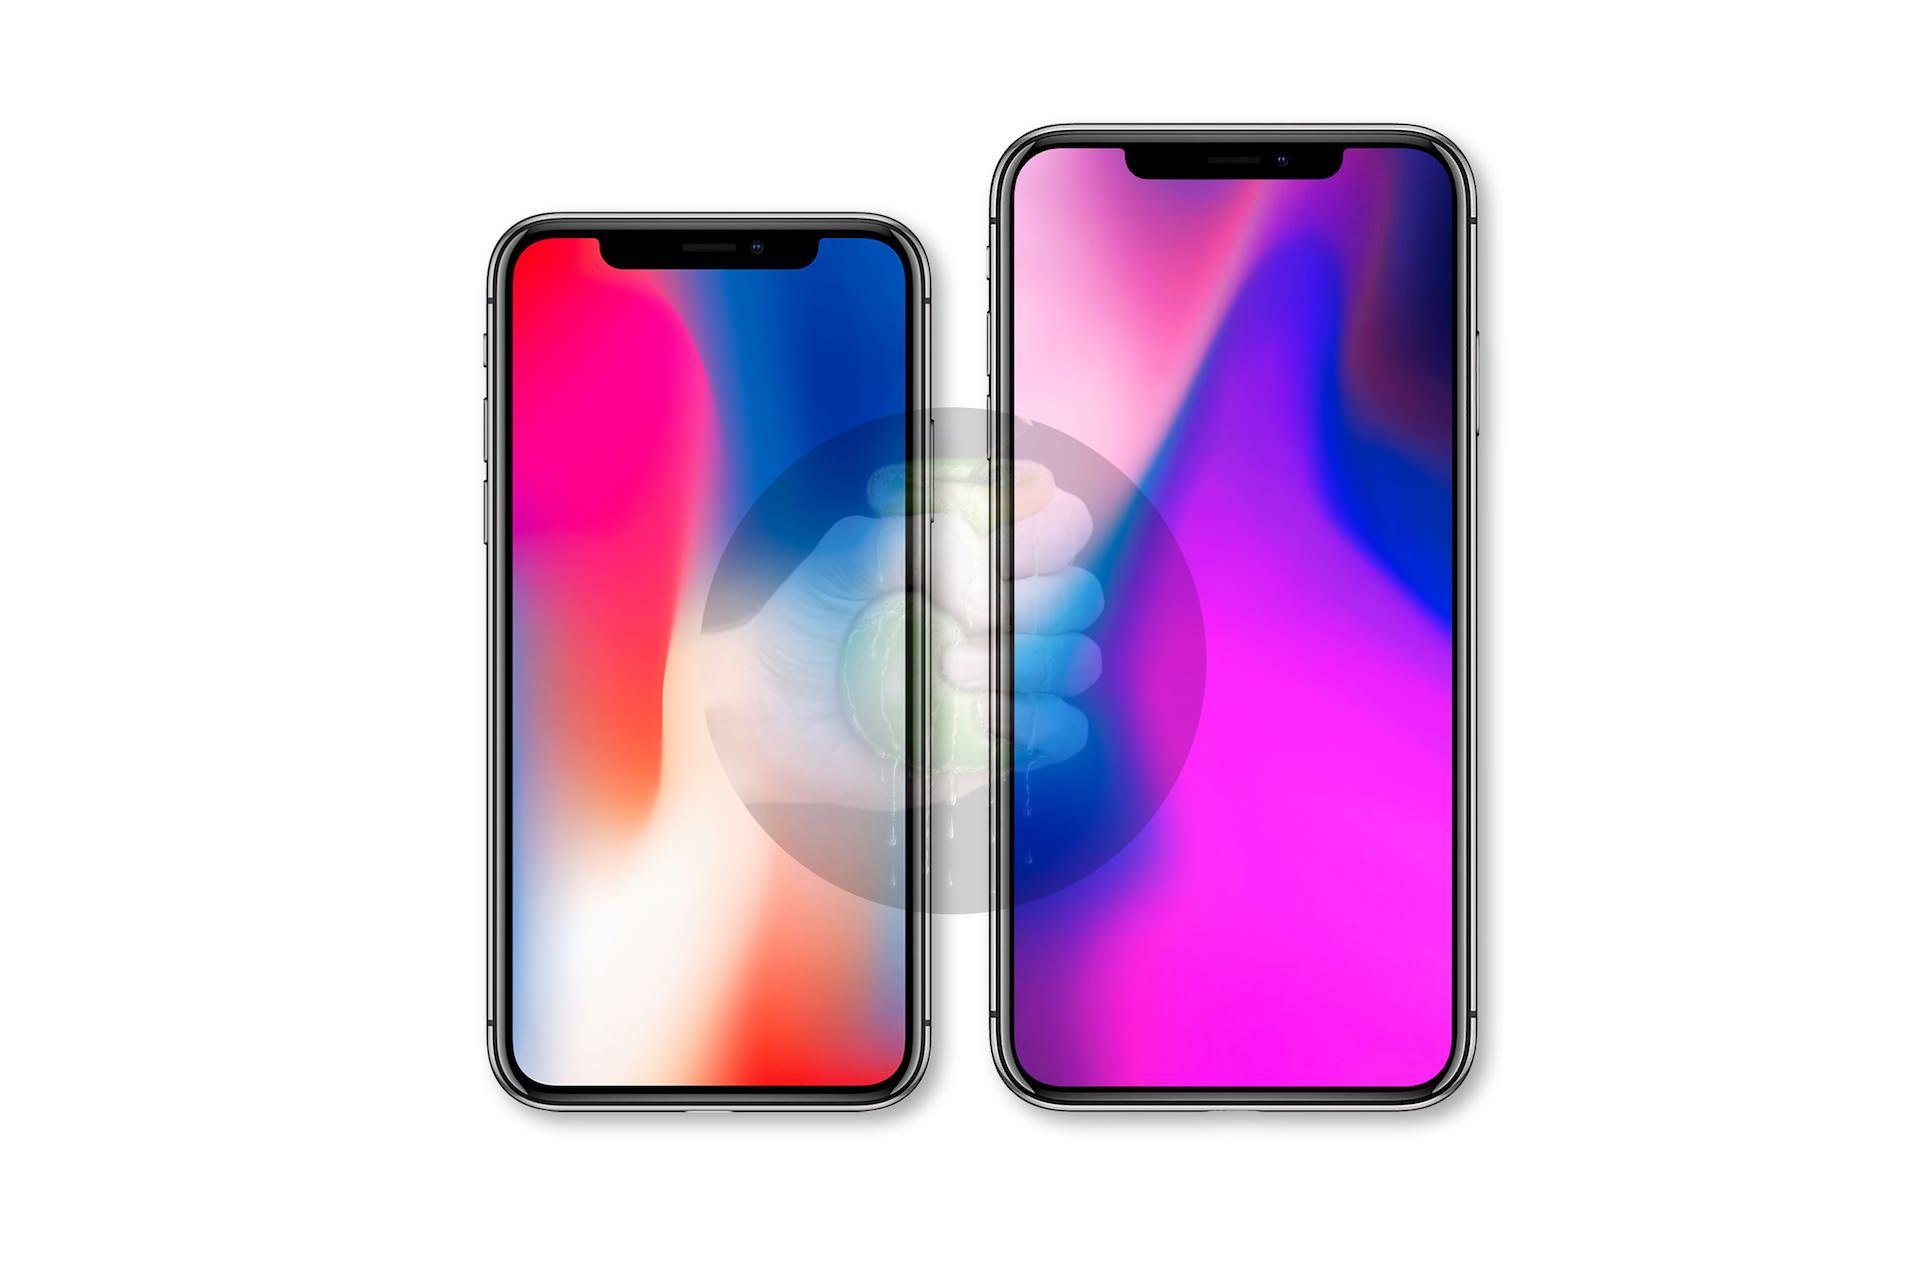 iPhone-9-wylsacom-3.jpg